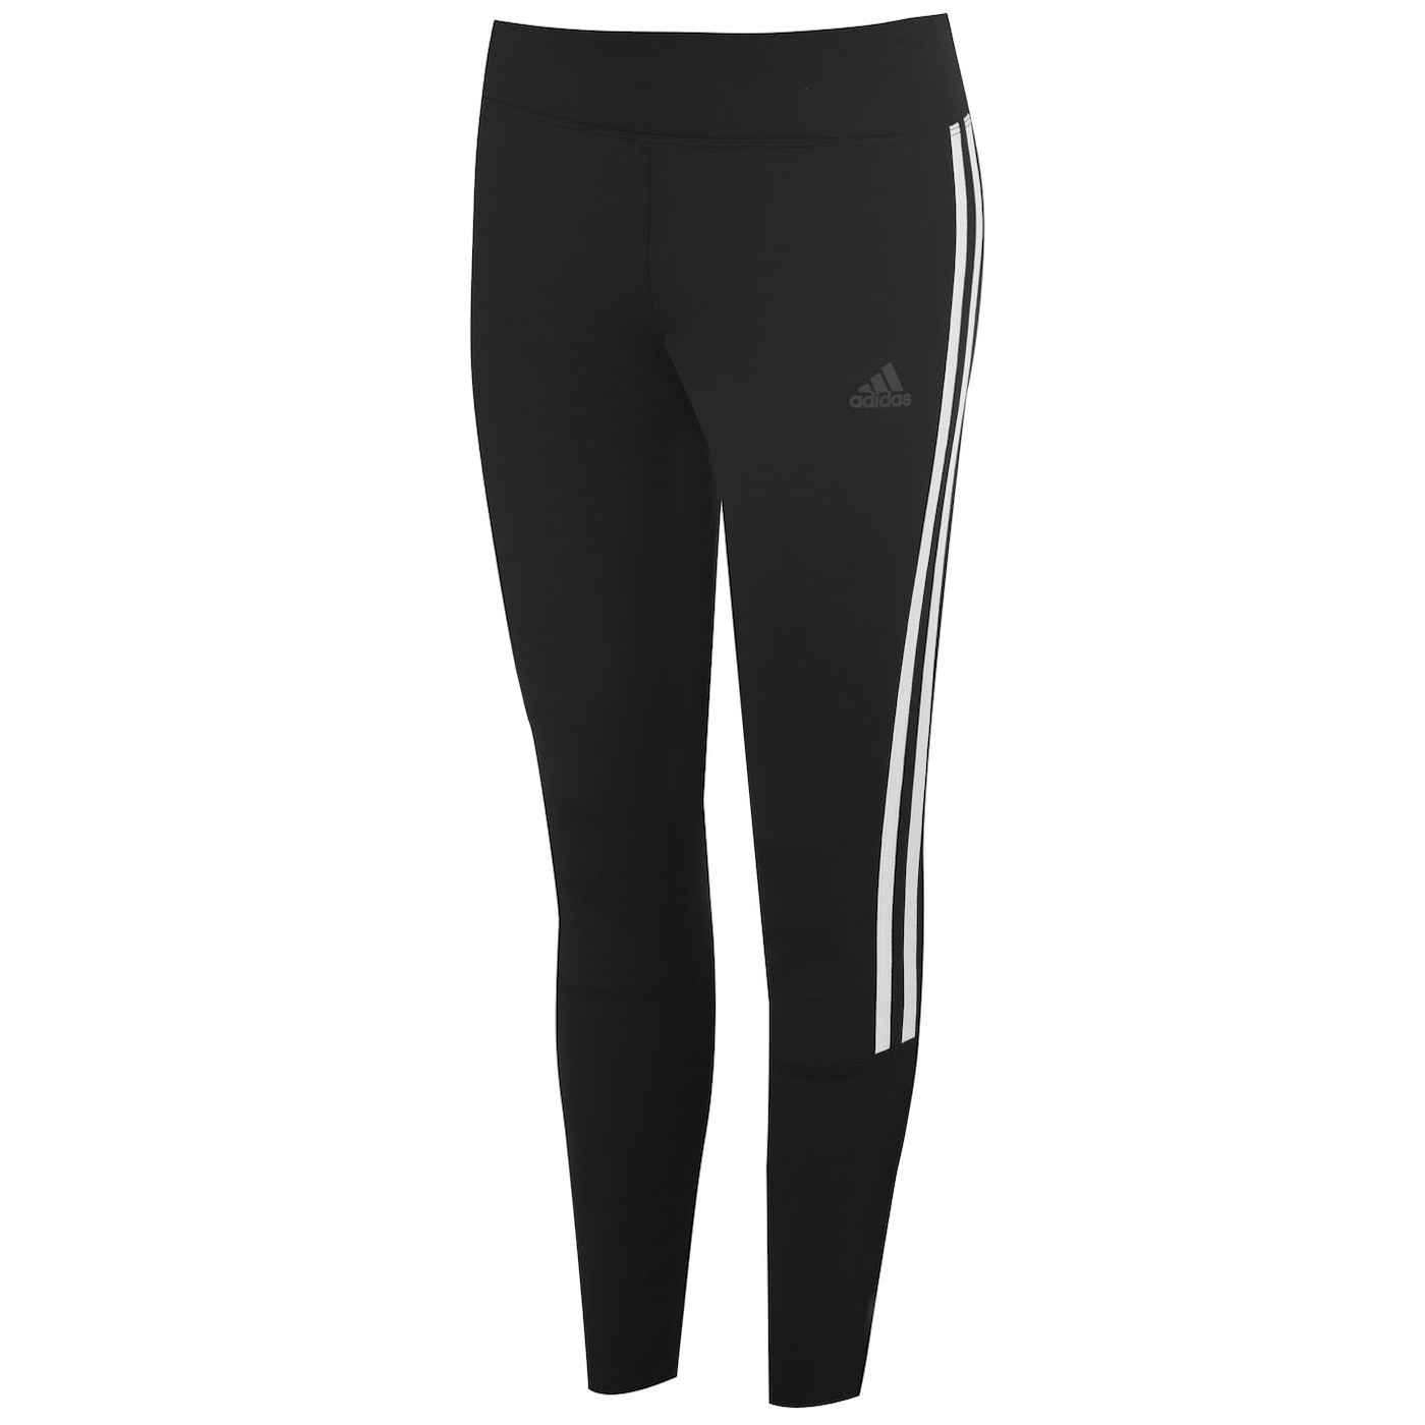 Adidas Run 3 Stripes